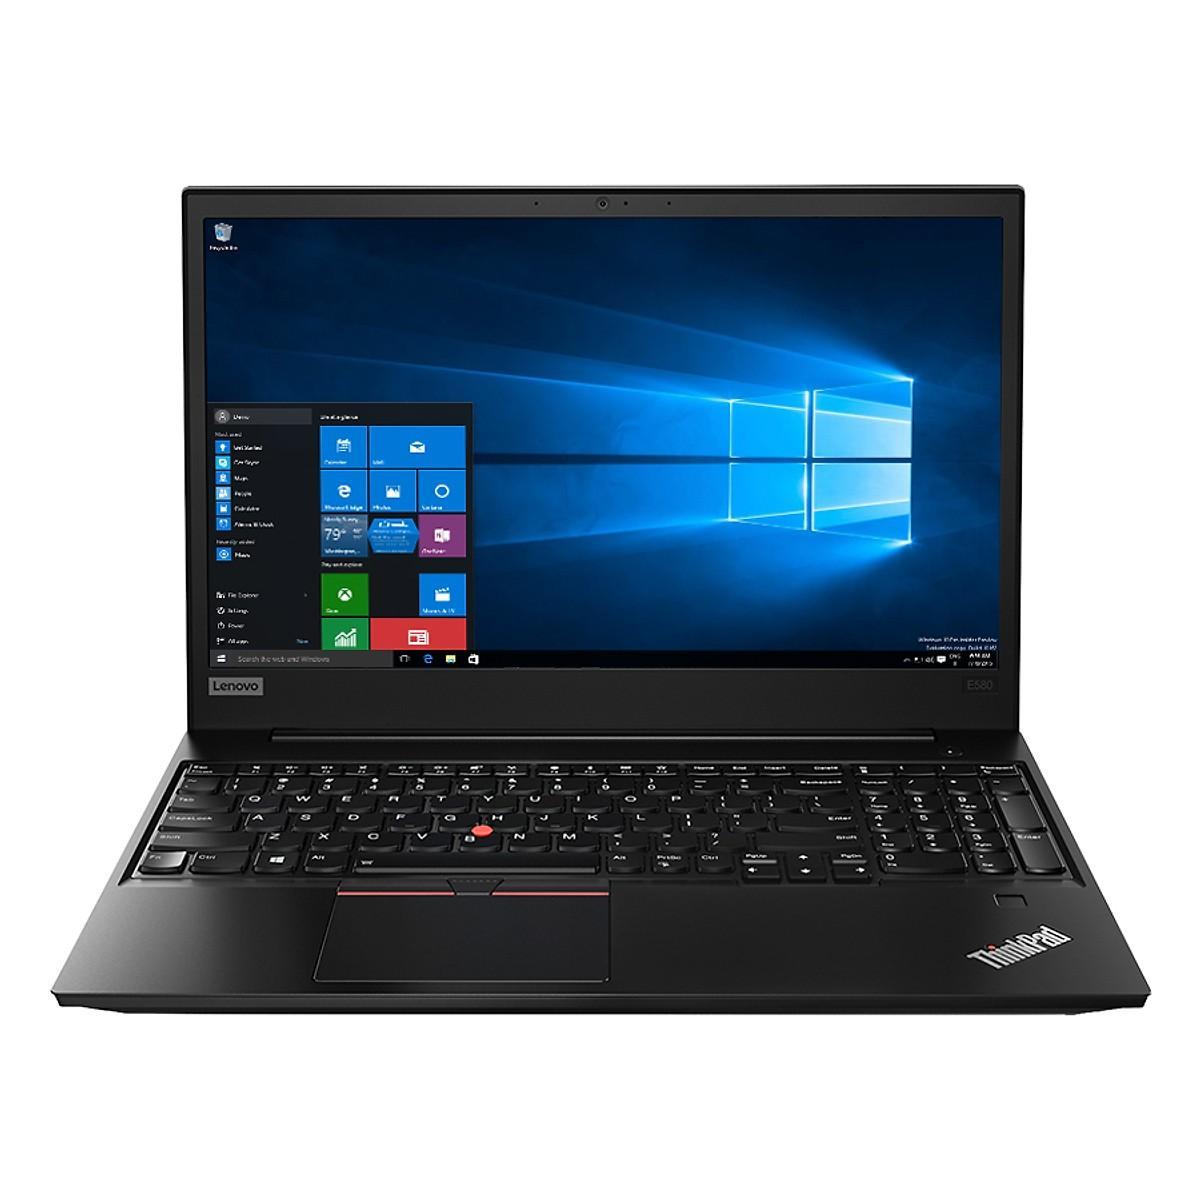 Laptop Lenovo ThinkPad Edge E580 20KS005NVA Core i5-8250U/Free Dos (15.6 inch) (Black)